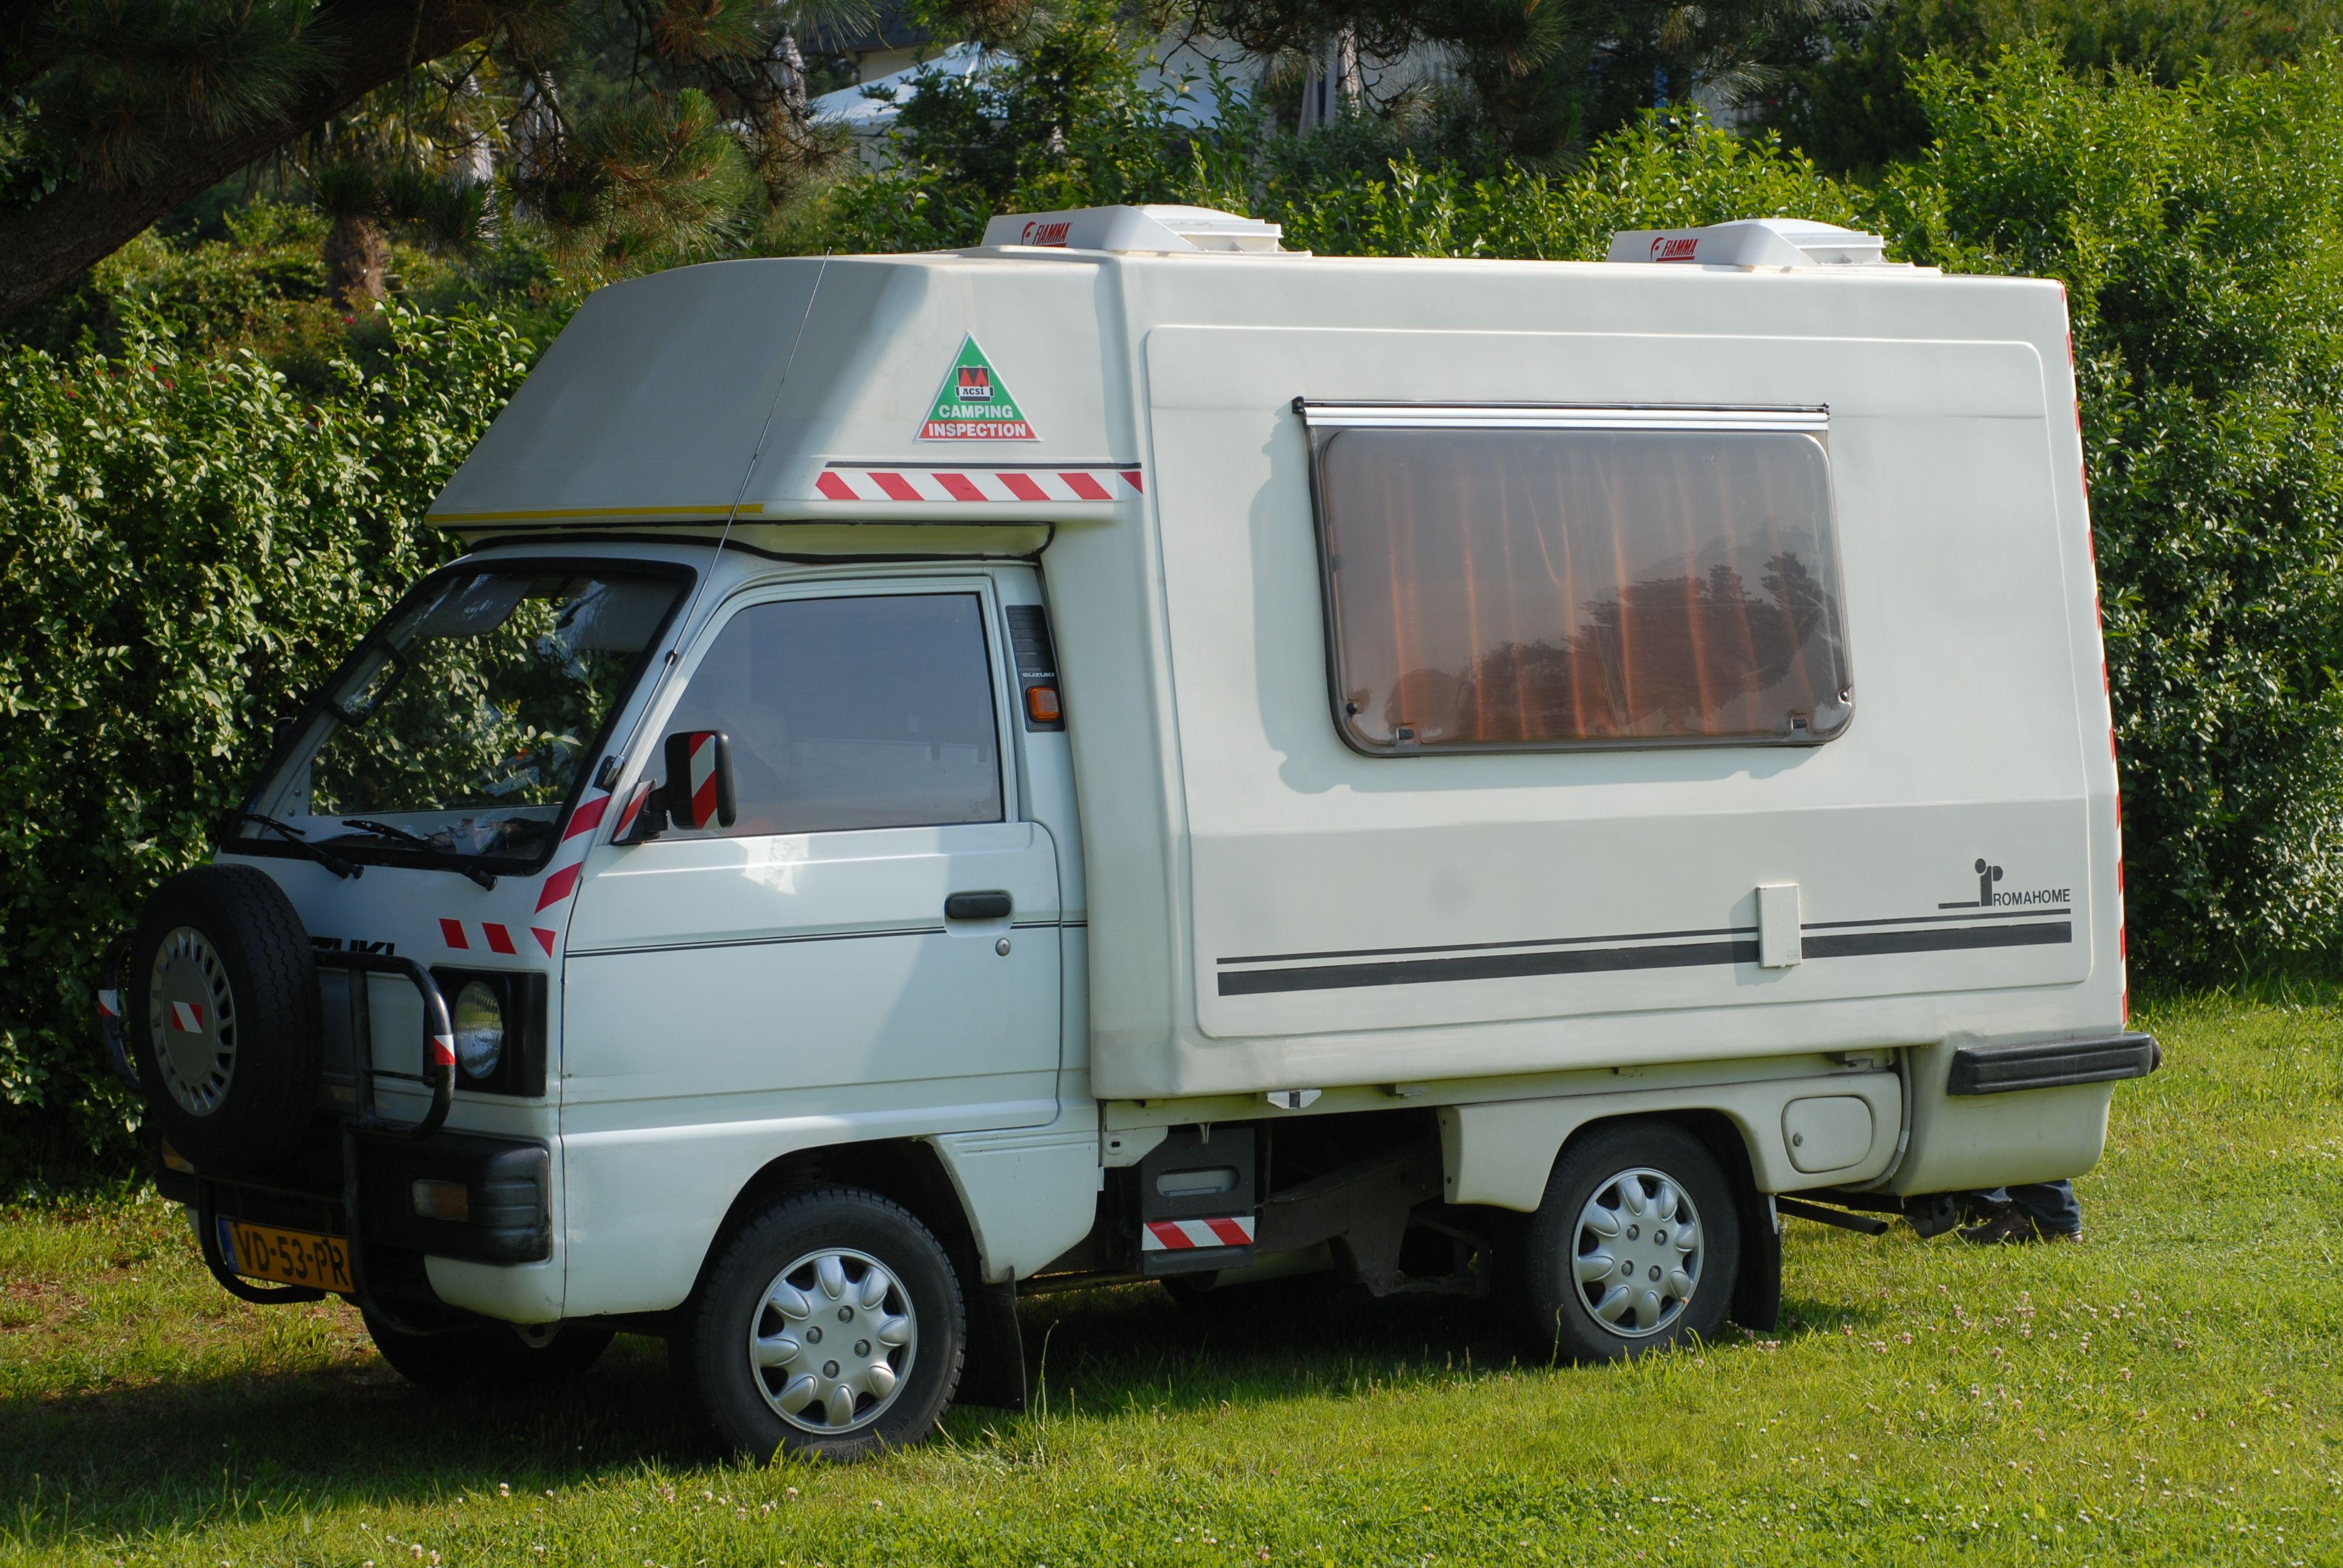 micro mini campers un mini camping car aux plages de beg. Black Bedroom Furniture Sets. Home Design Ideas